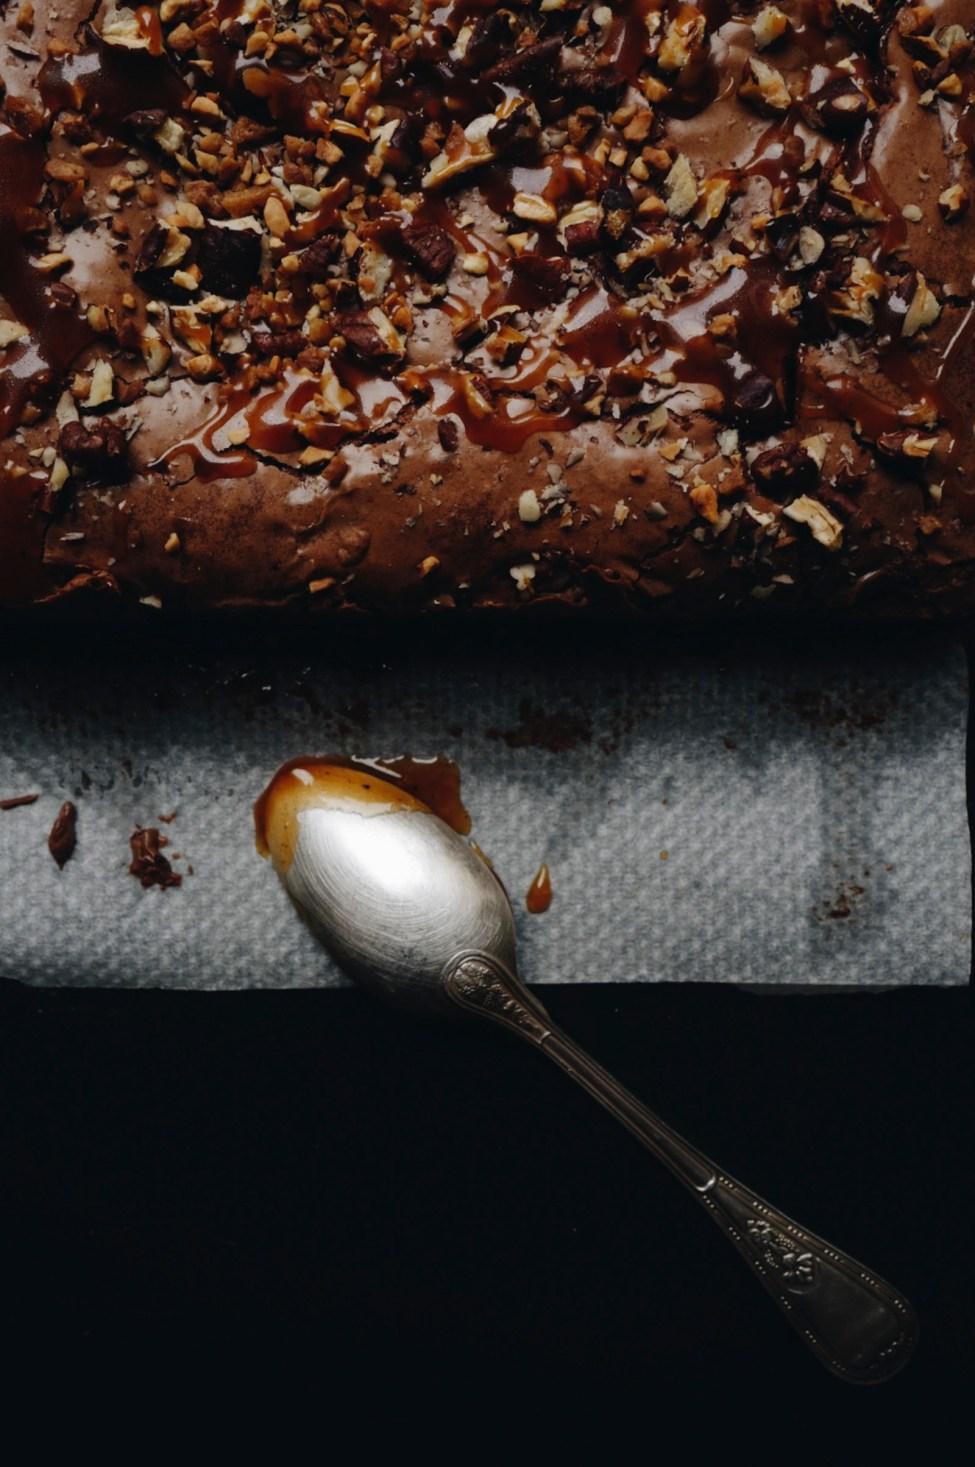 Le brownie caramel beurre salé